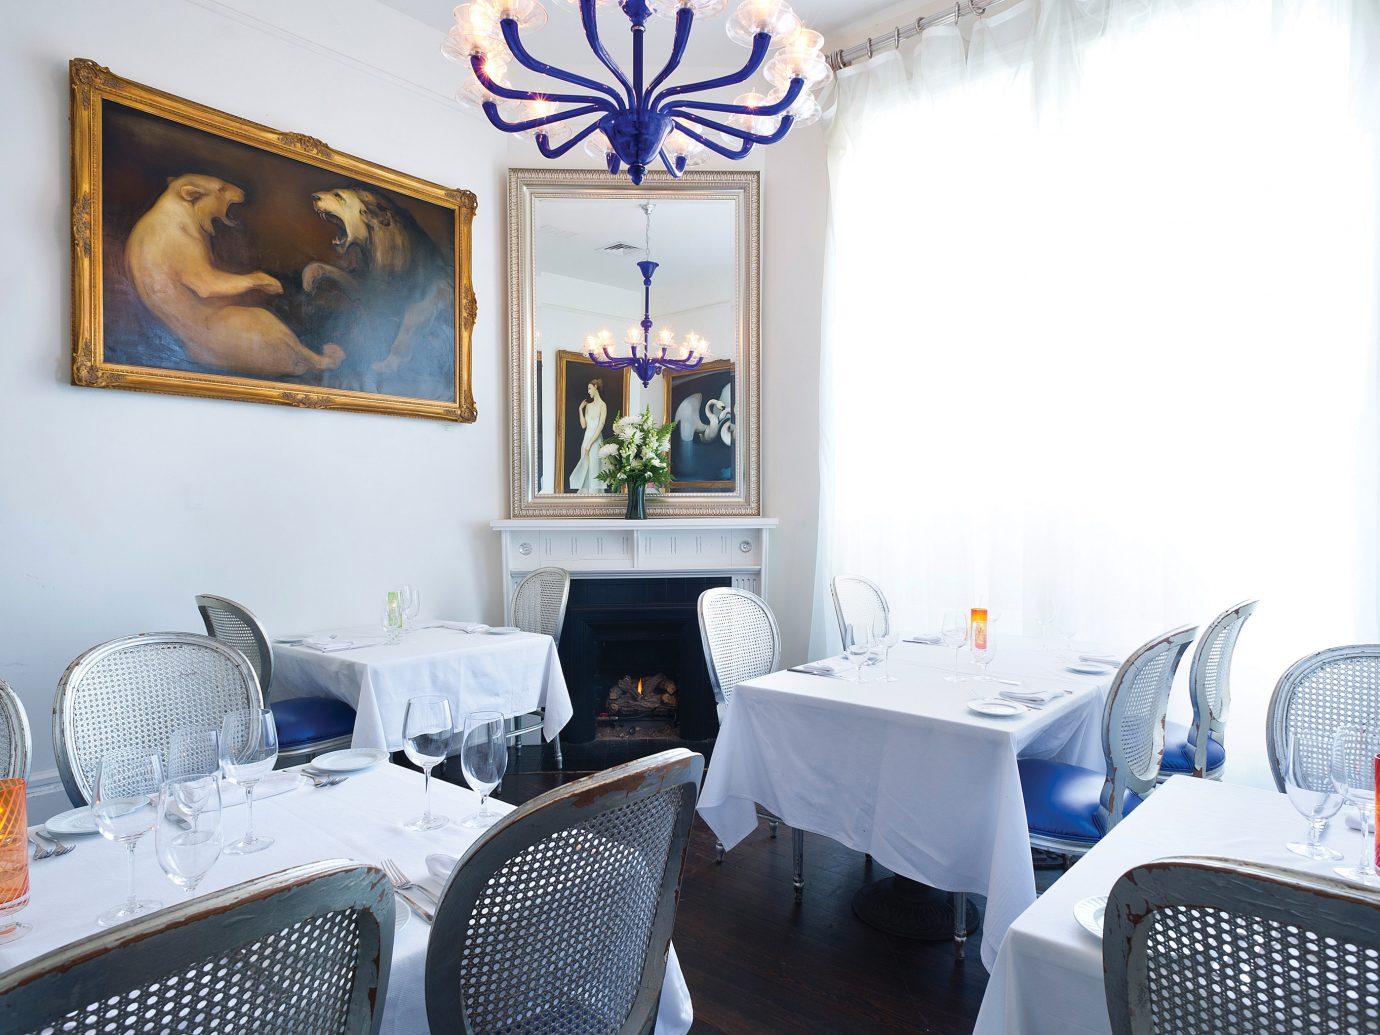 Food + Drink indoor room restaurant table interior design dining room furniture decorated